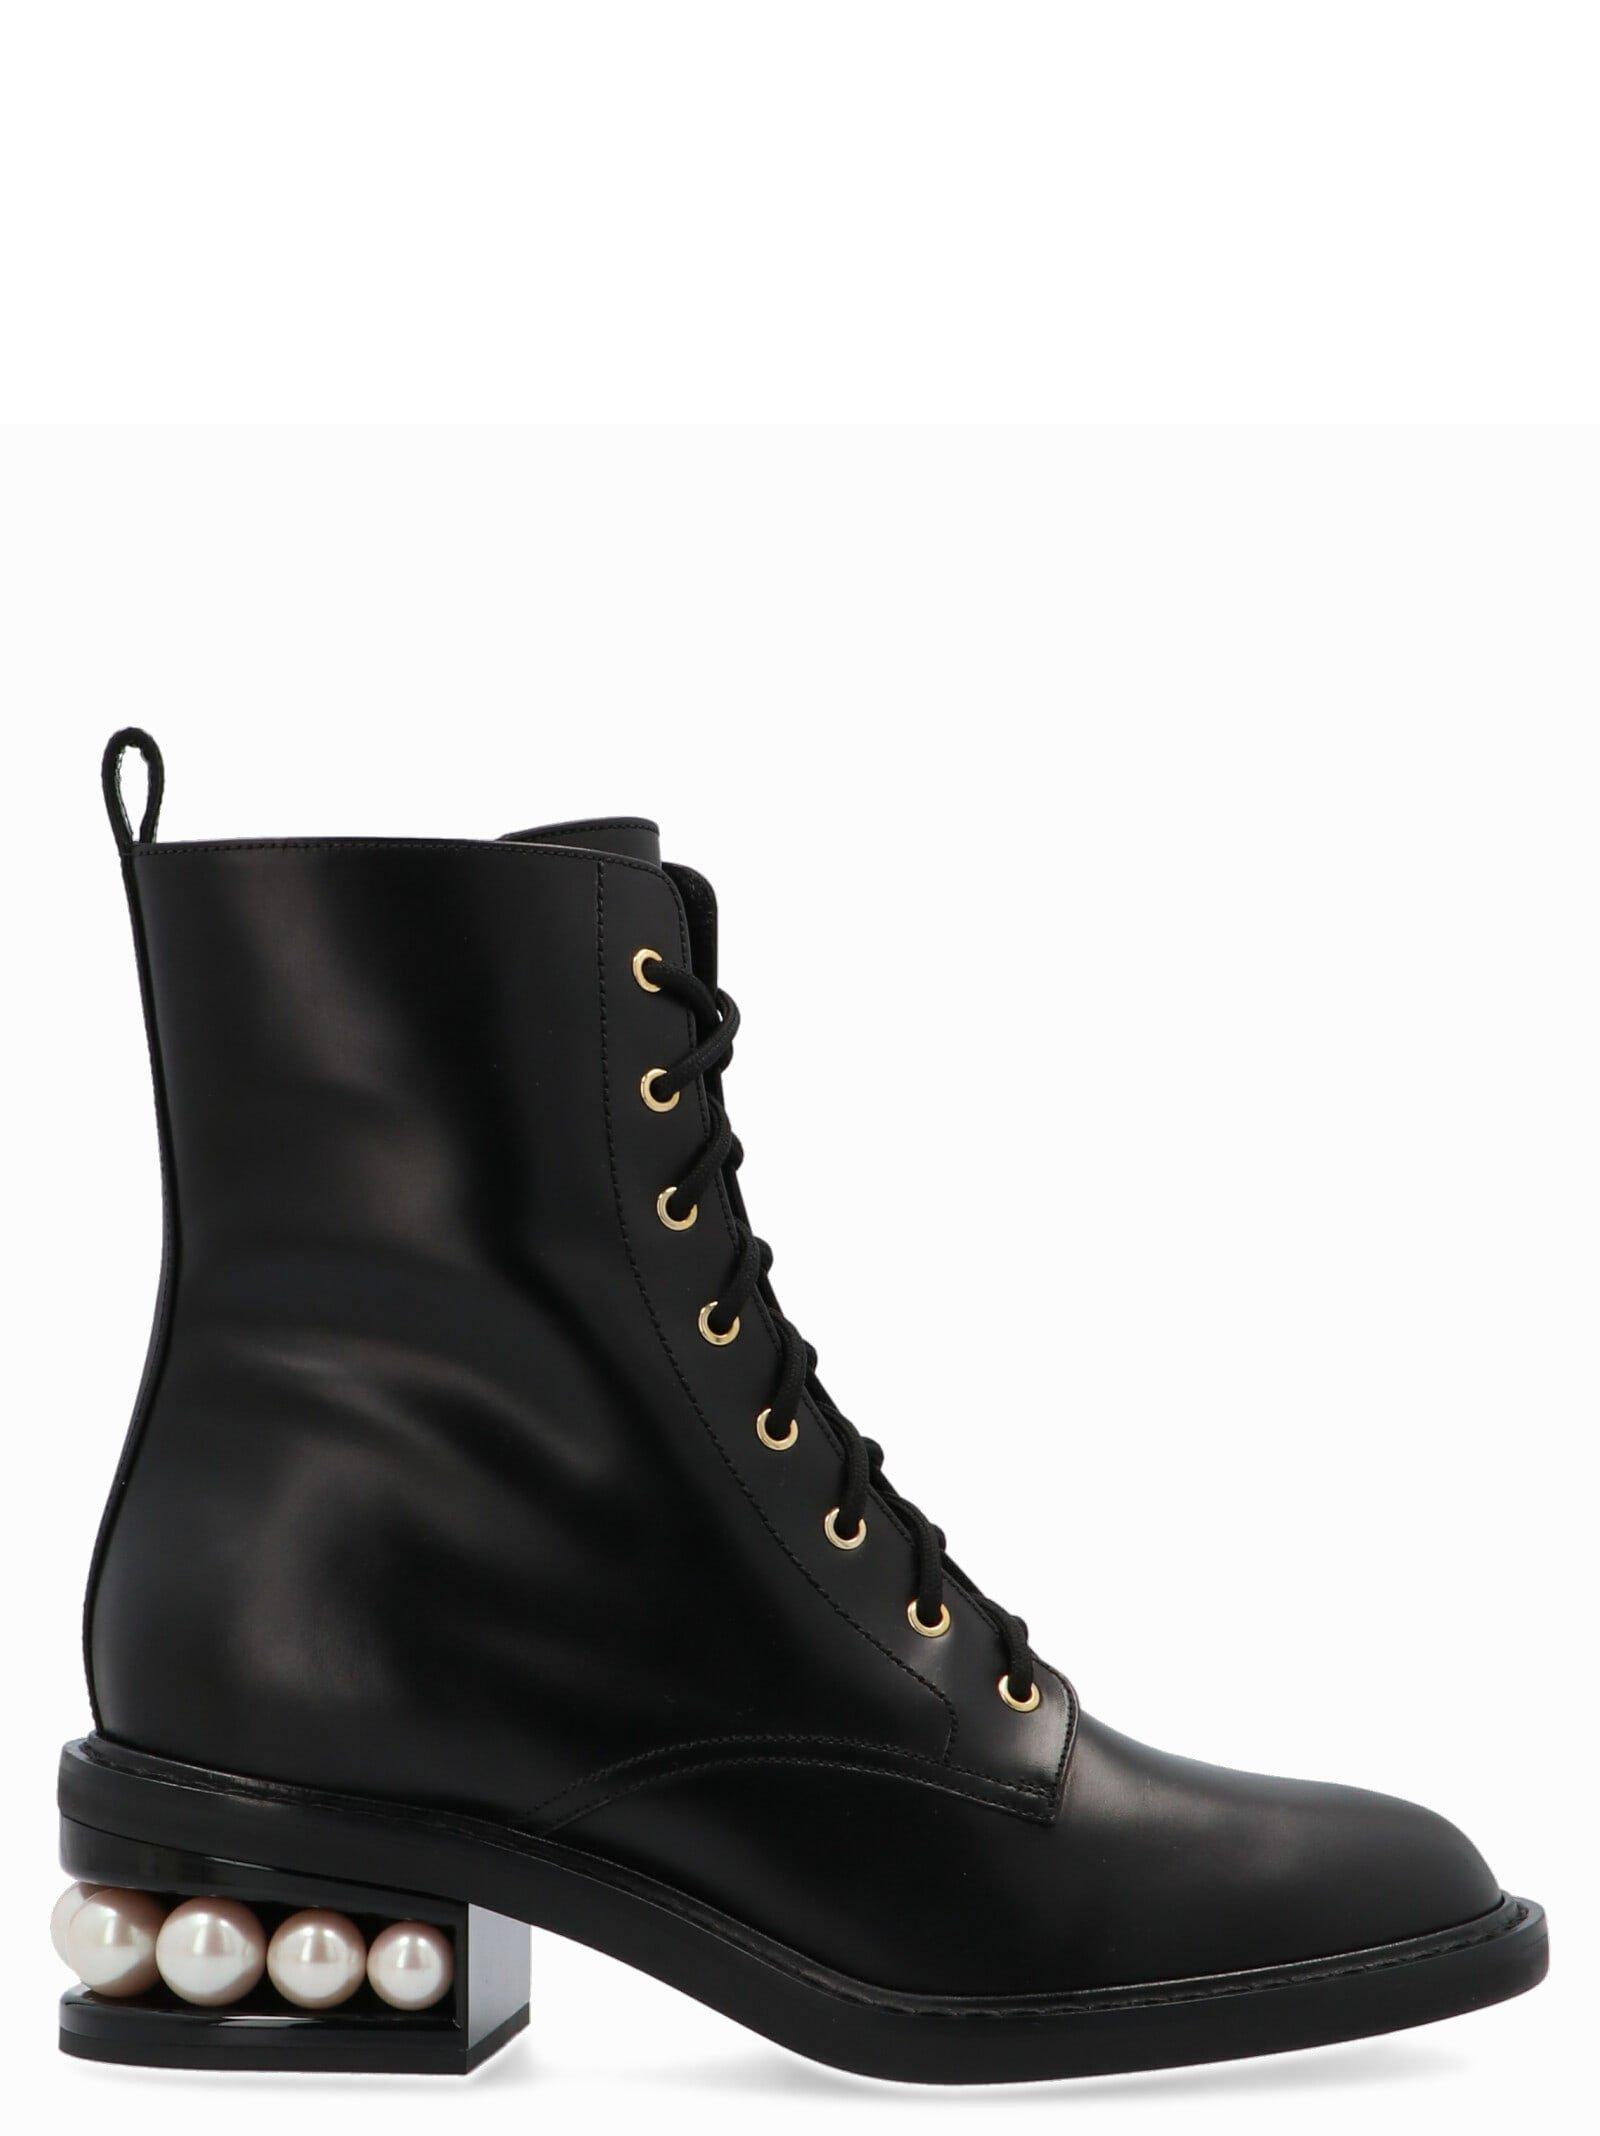 Nicholas Kirkwood casati Shoes